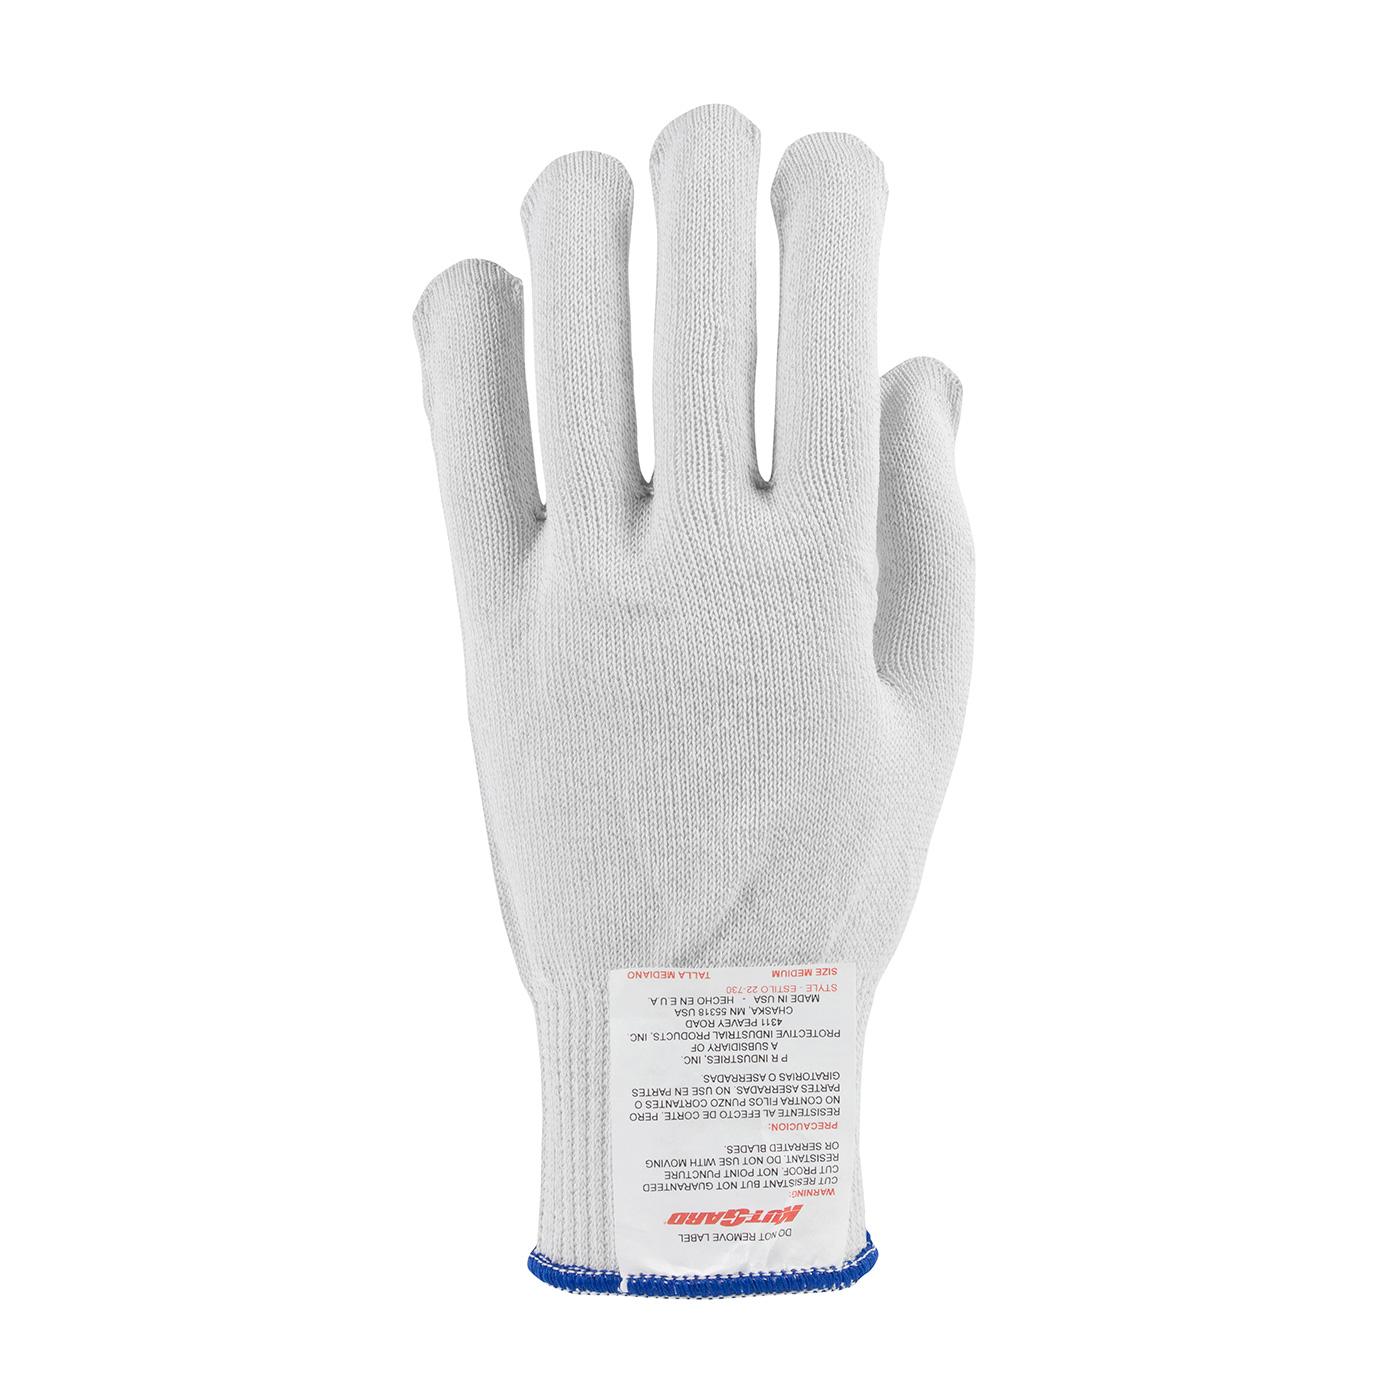 PIP Kut Gard® White Seamless Knit PolyKor Cut Resistant Gloves - Light Weight